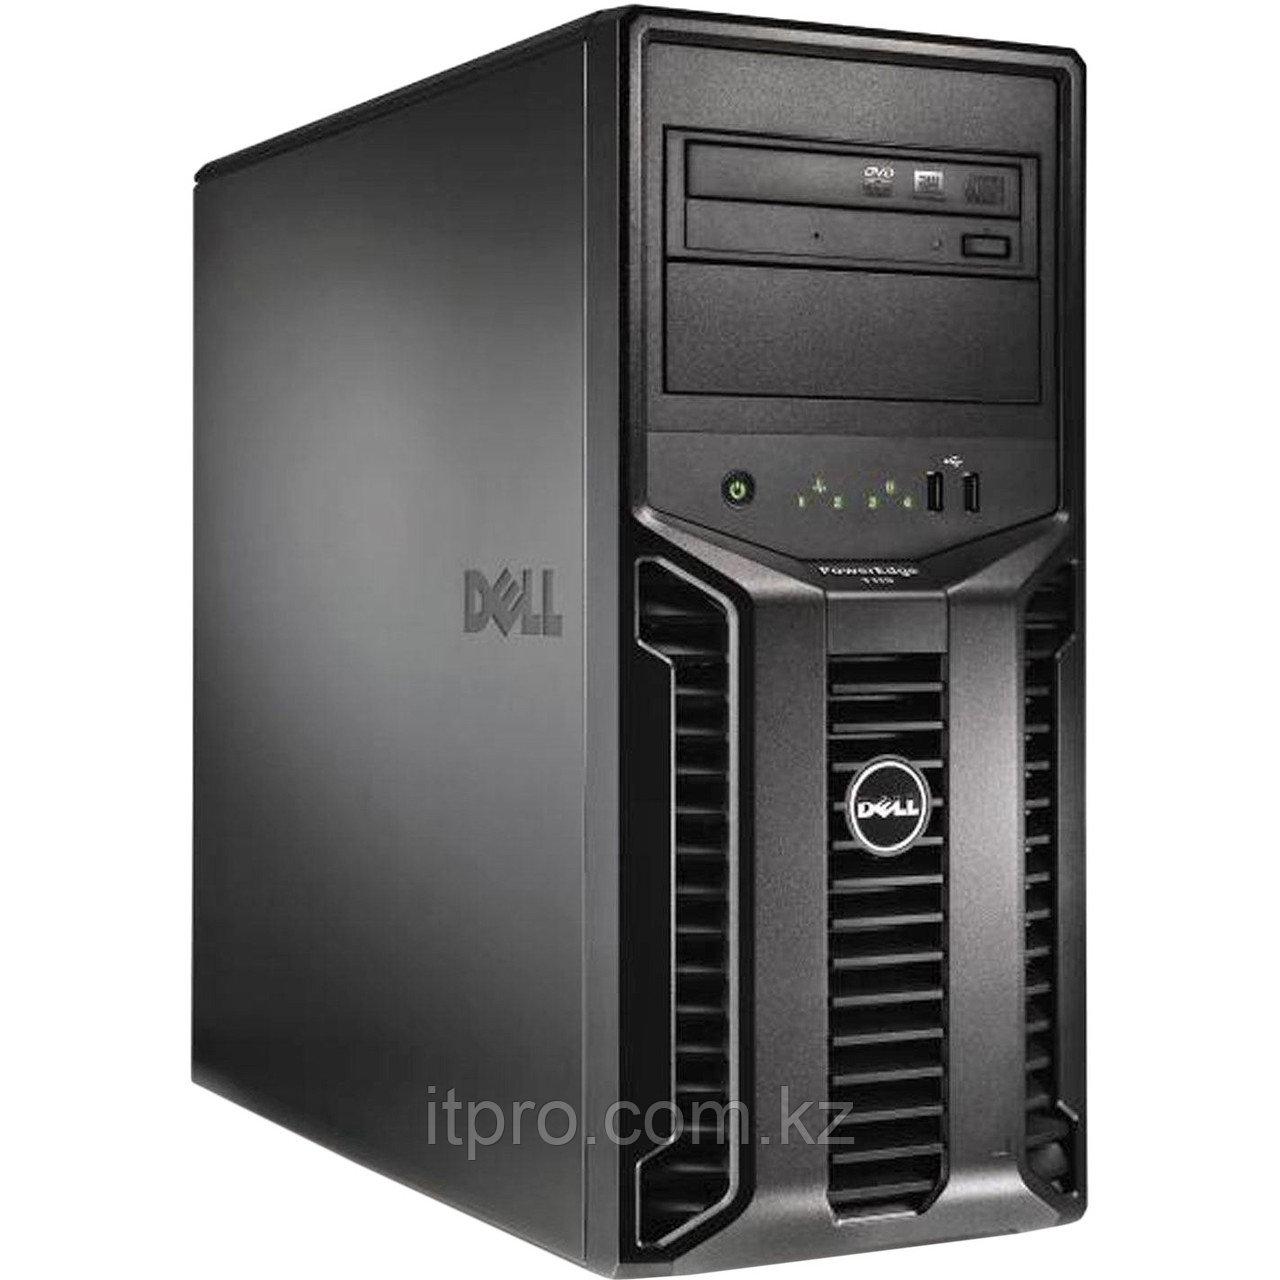 Сервер Dell/T110